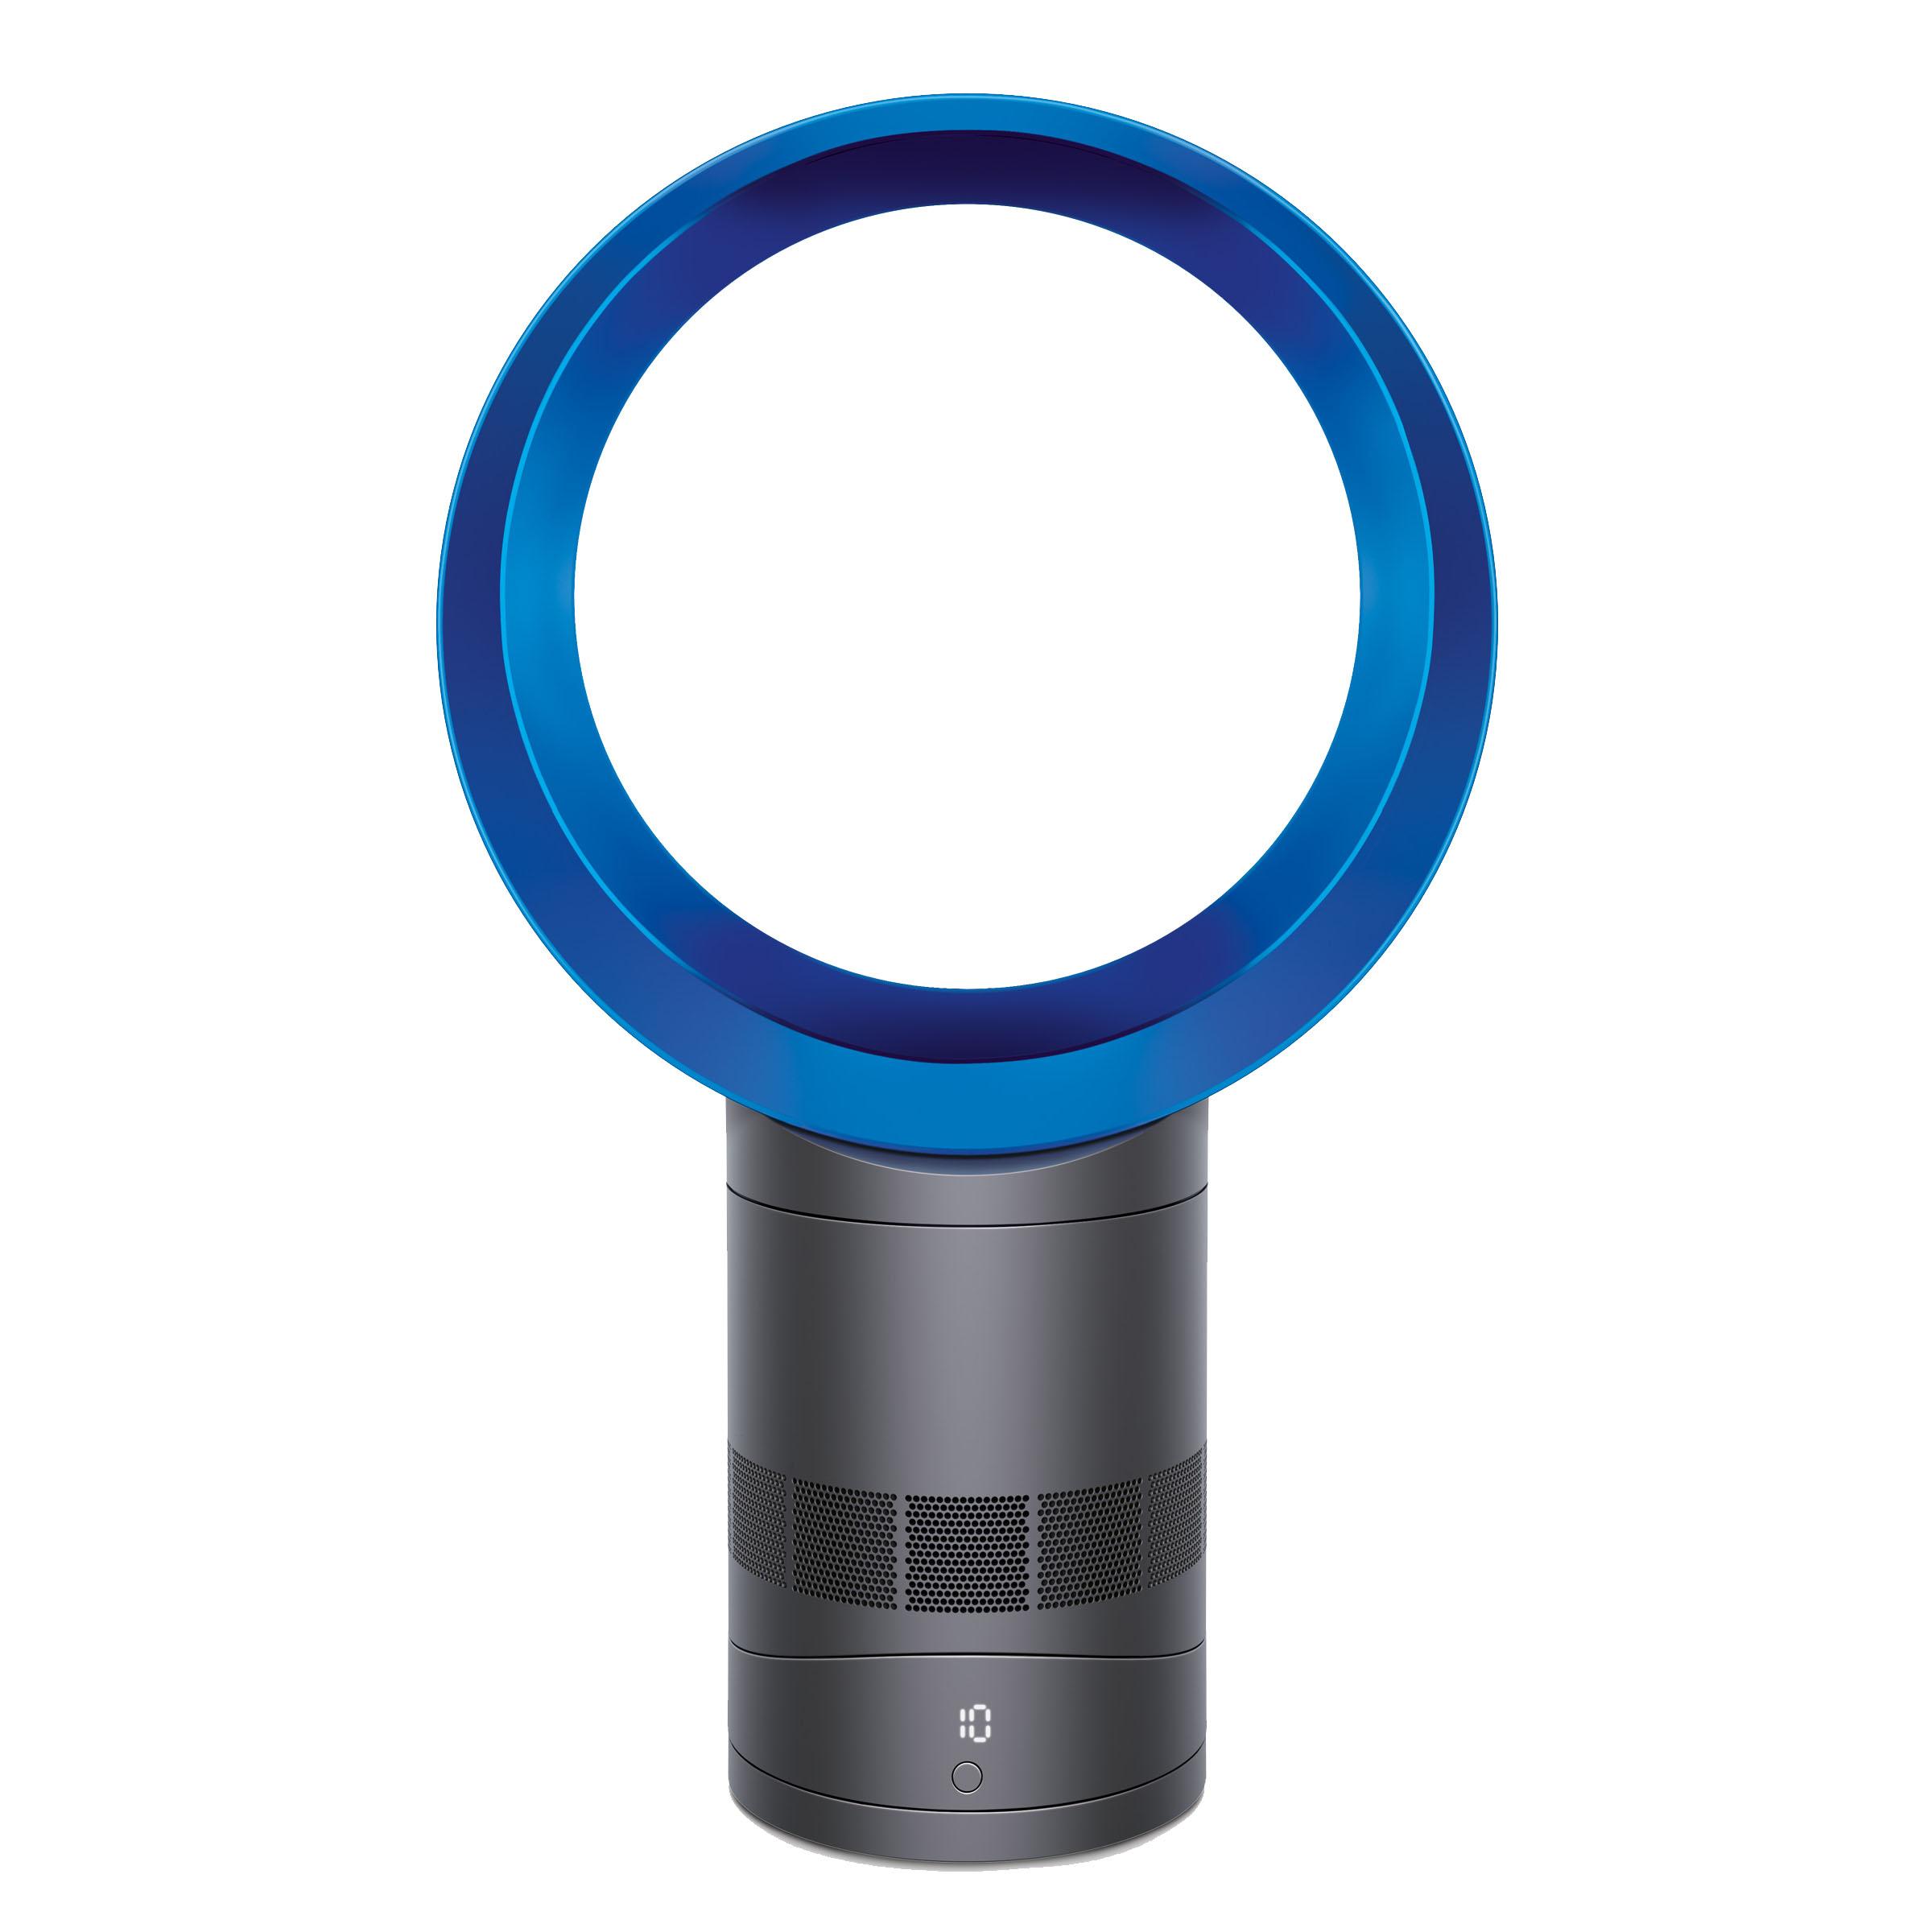 left iron fan blog cool fans pedestal blue o desk lesterchan dyson net